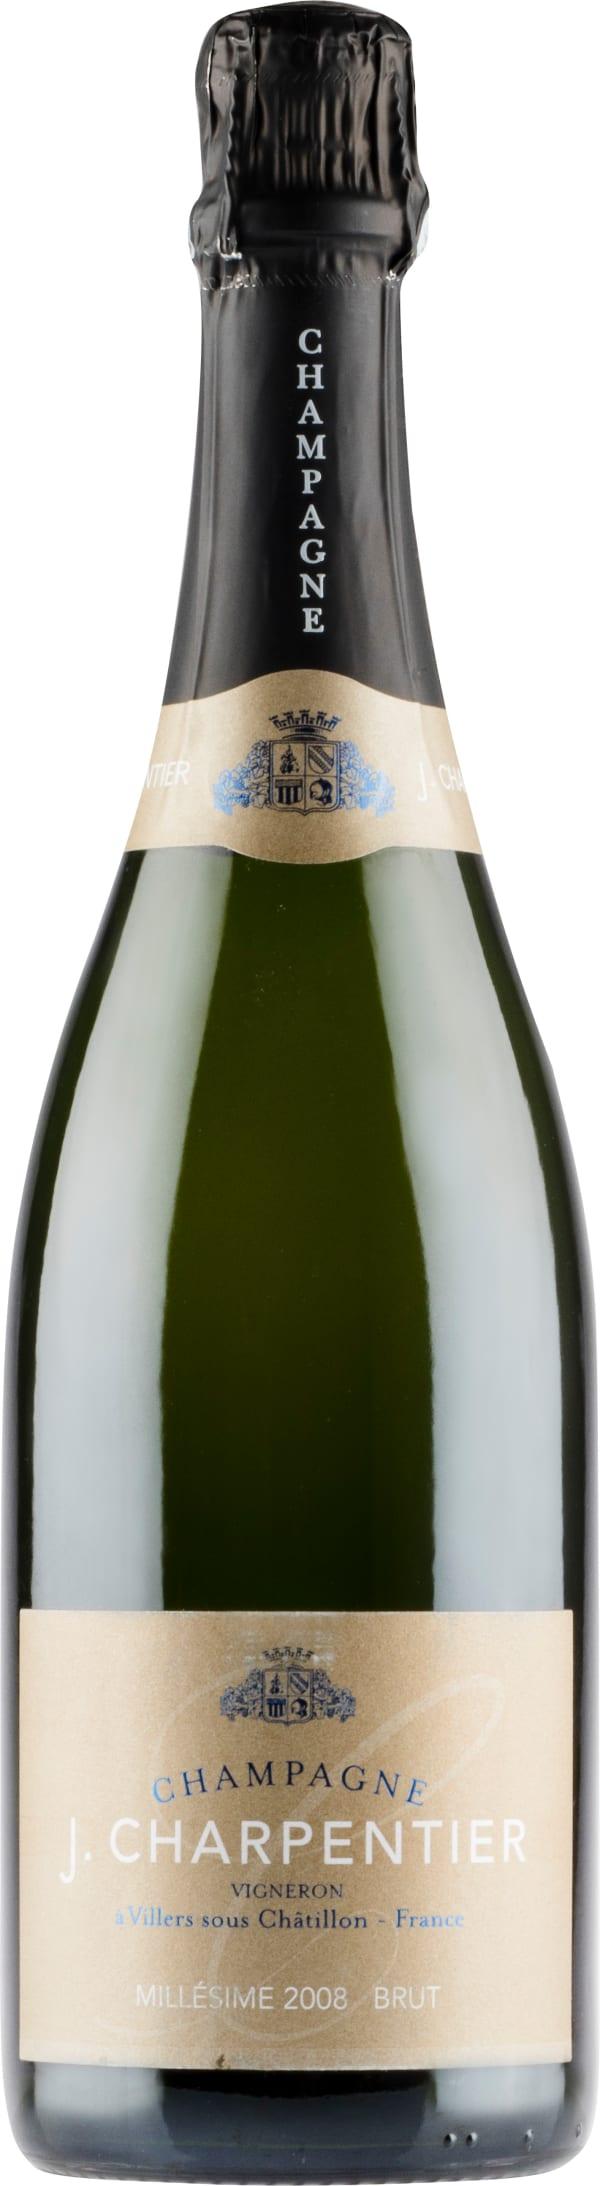 J. Charpentier Millésime Champagne Brut 2009